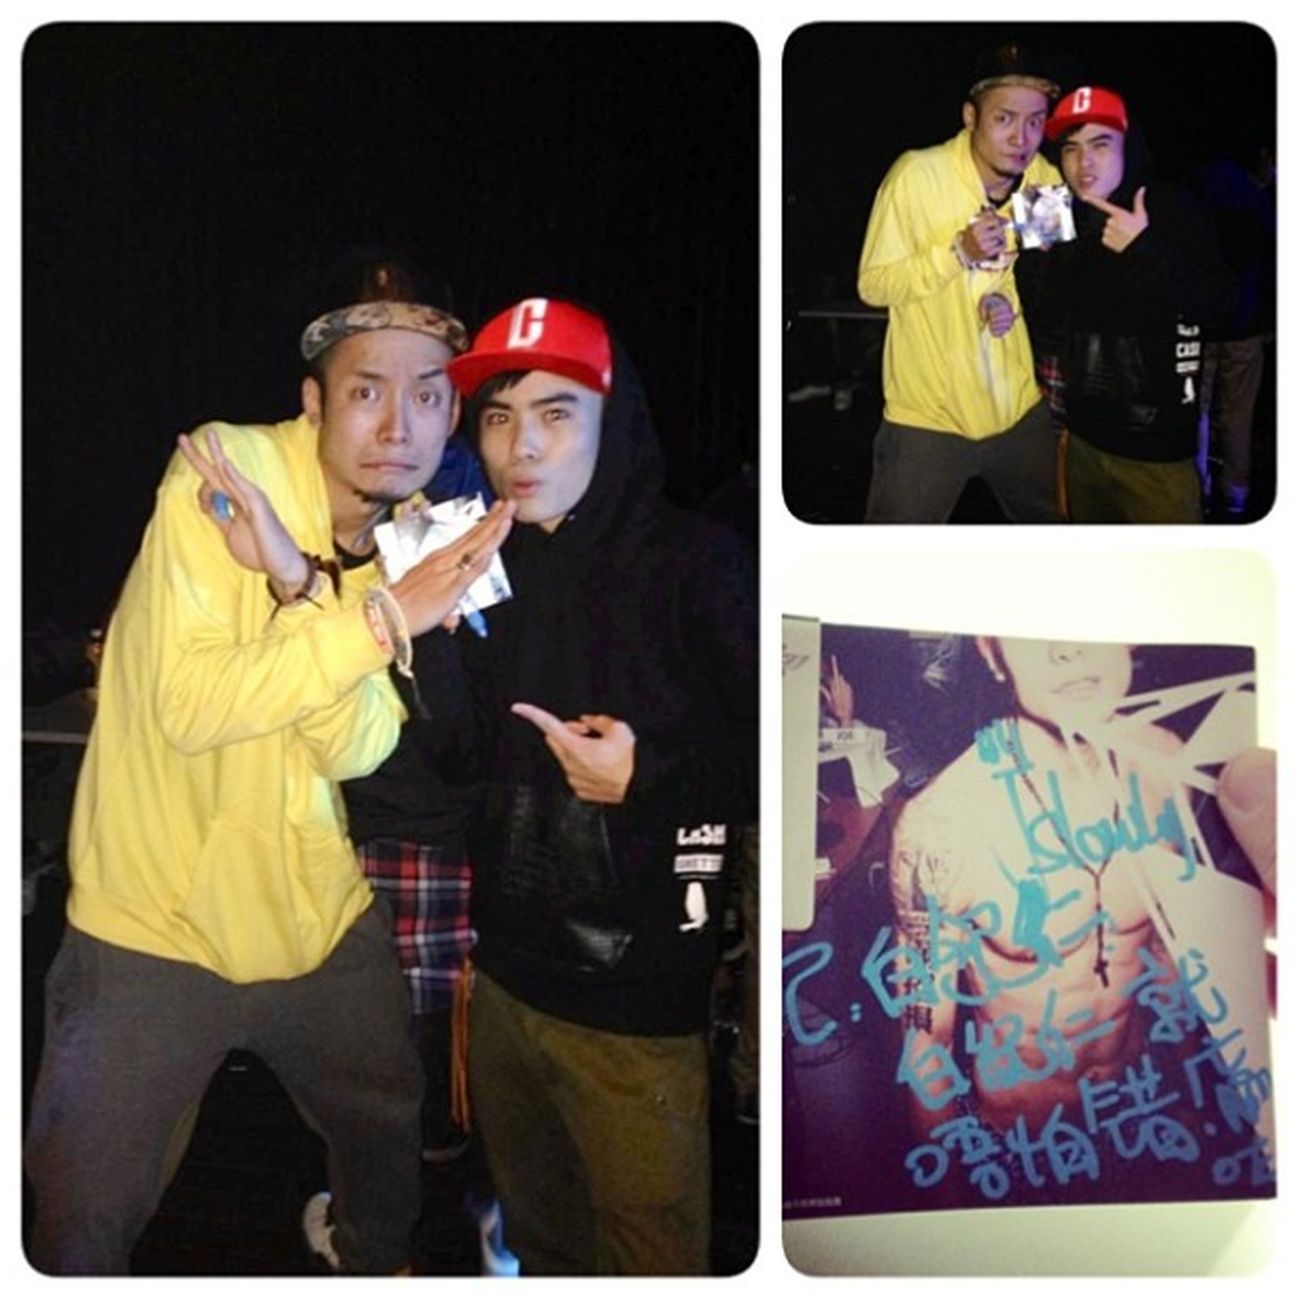 J$lowly徐真真✨广东队2013 HipHop Chillgun 徐真真 未必真得晒 ghetto 广东队 ghettobro ???